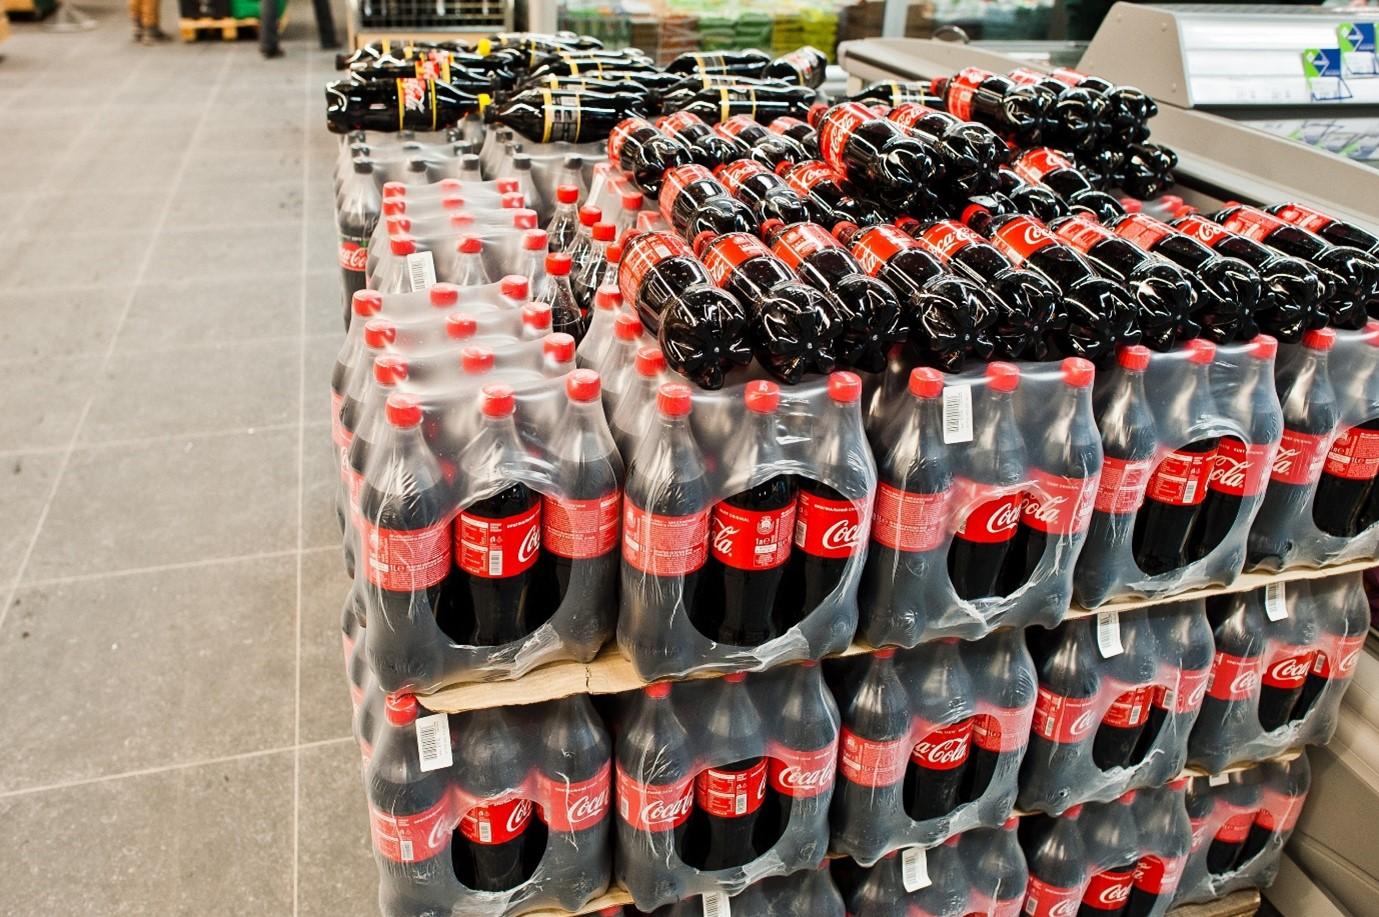 Coca-Cola bottles in a shop.